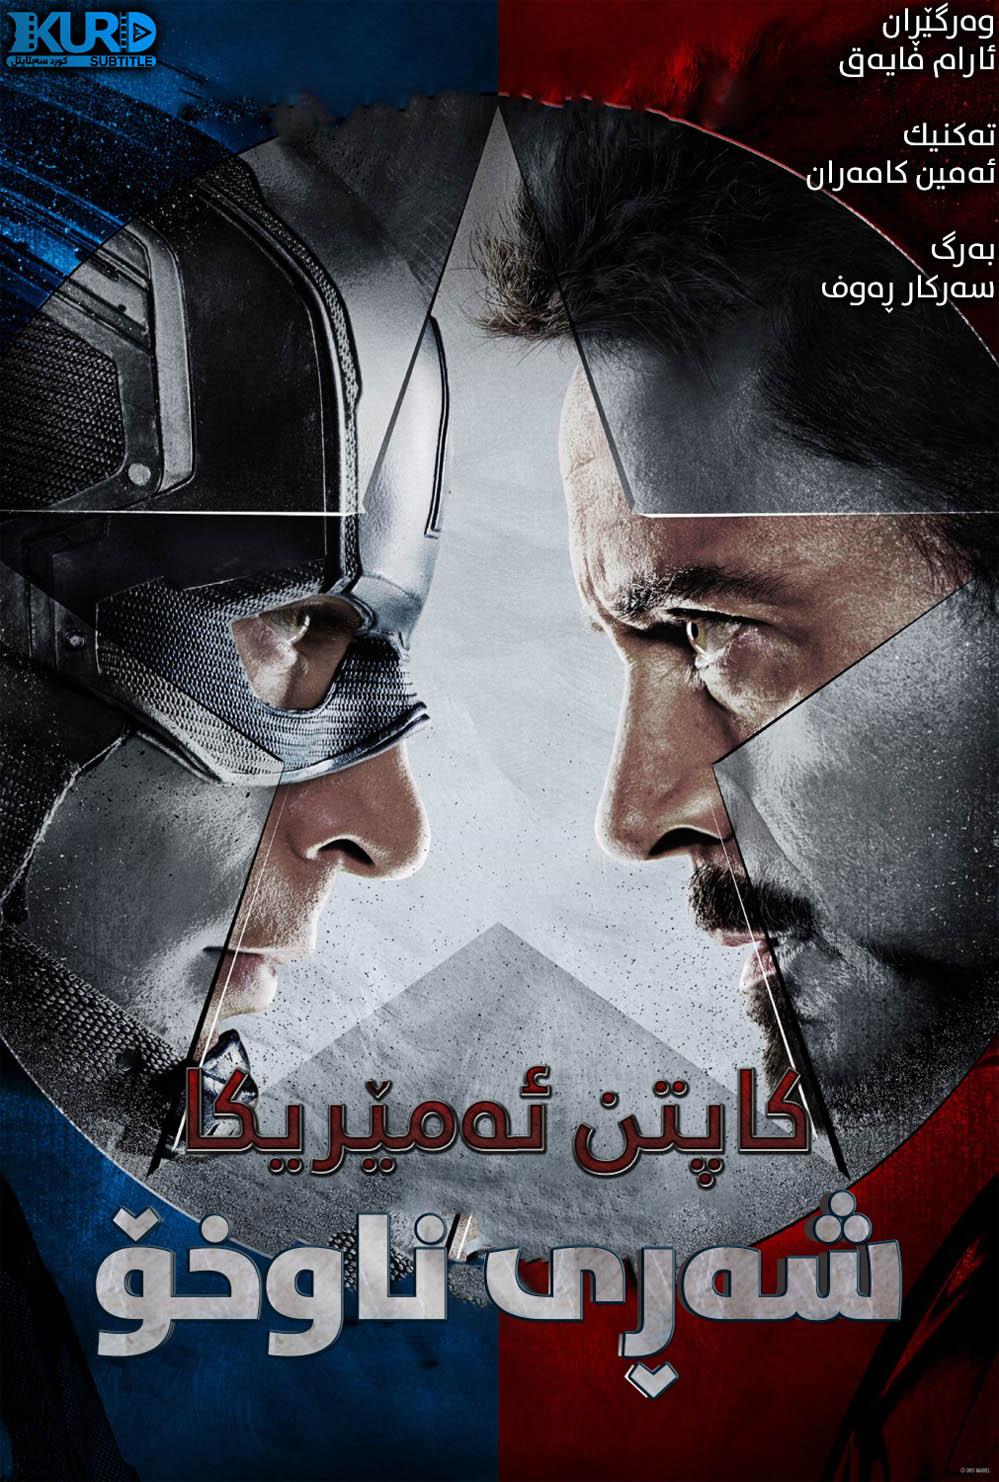 Captain America: Civil War kurdish poster